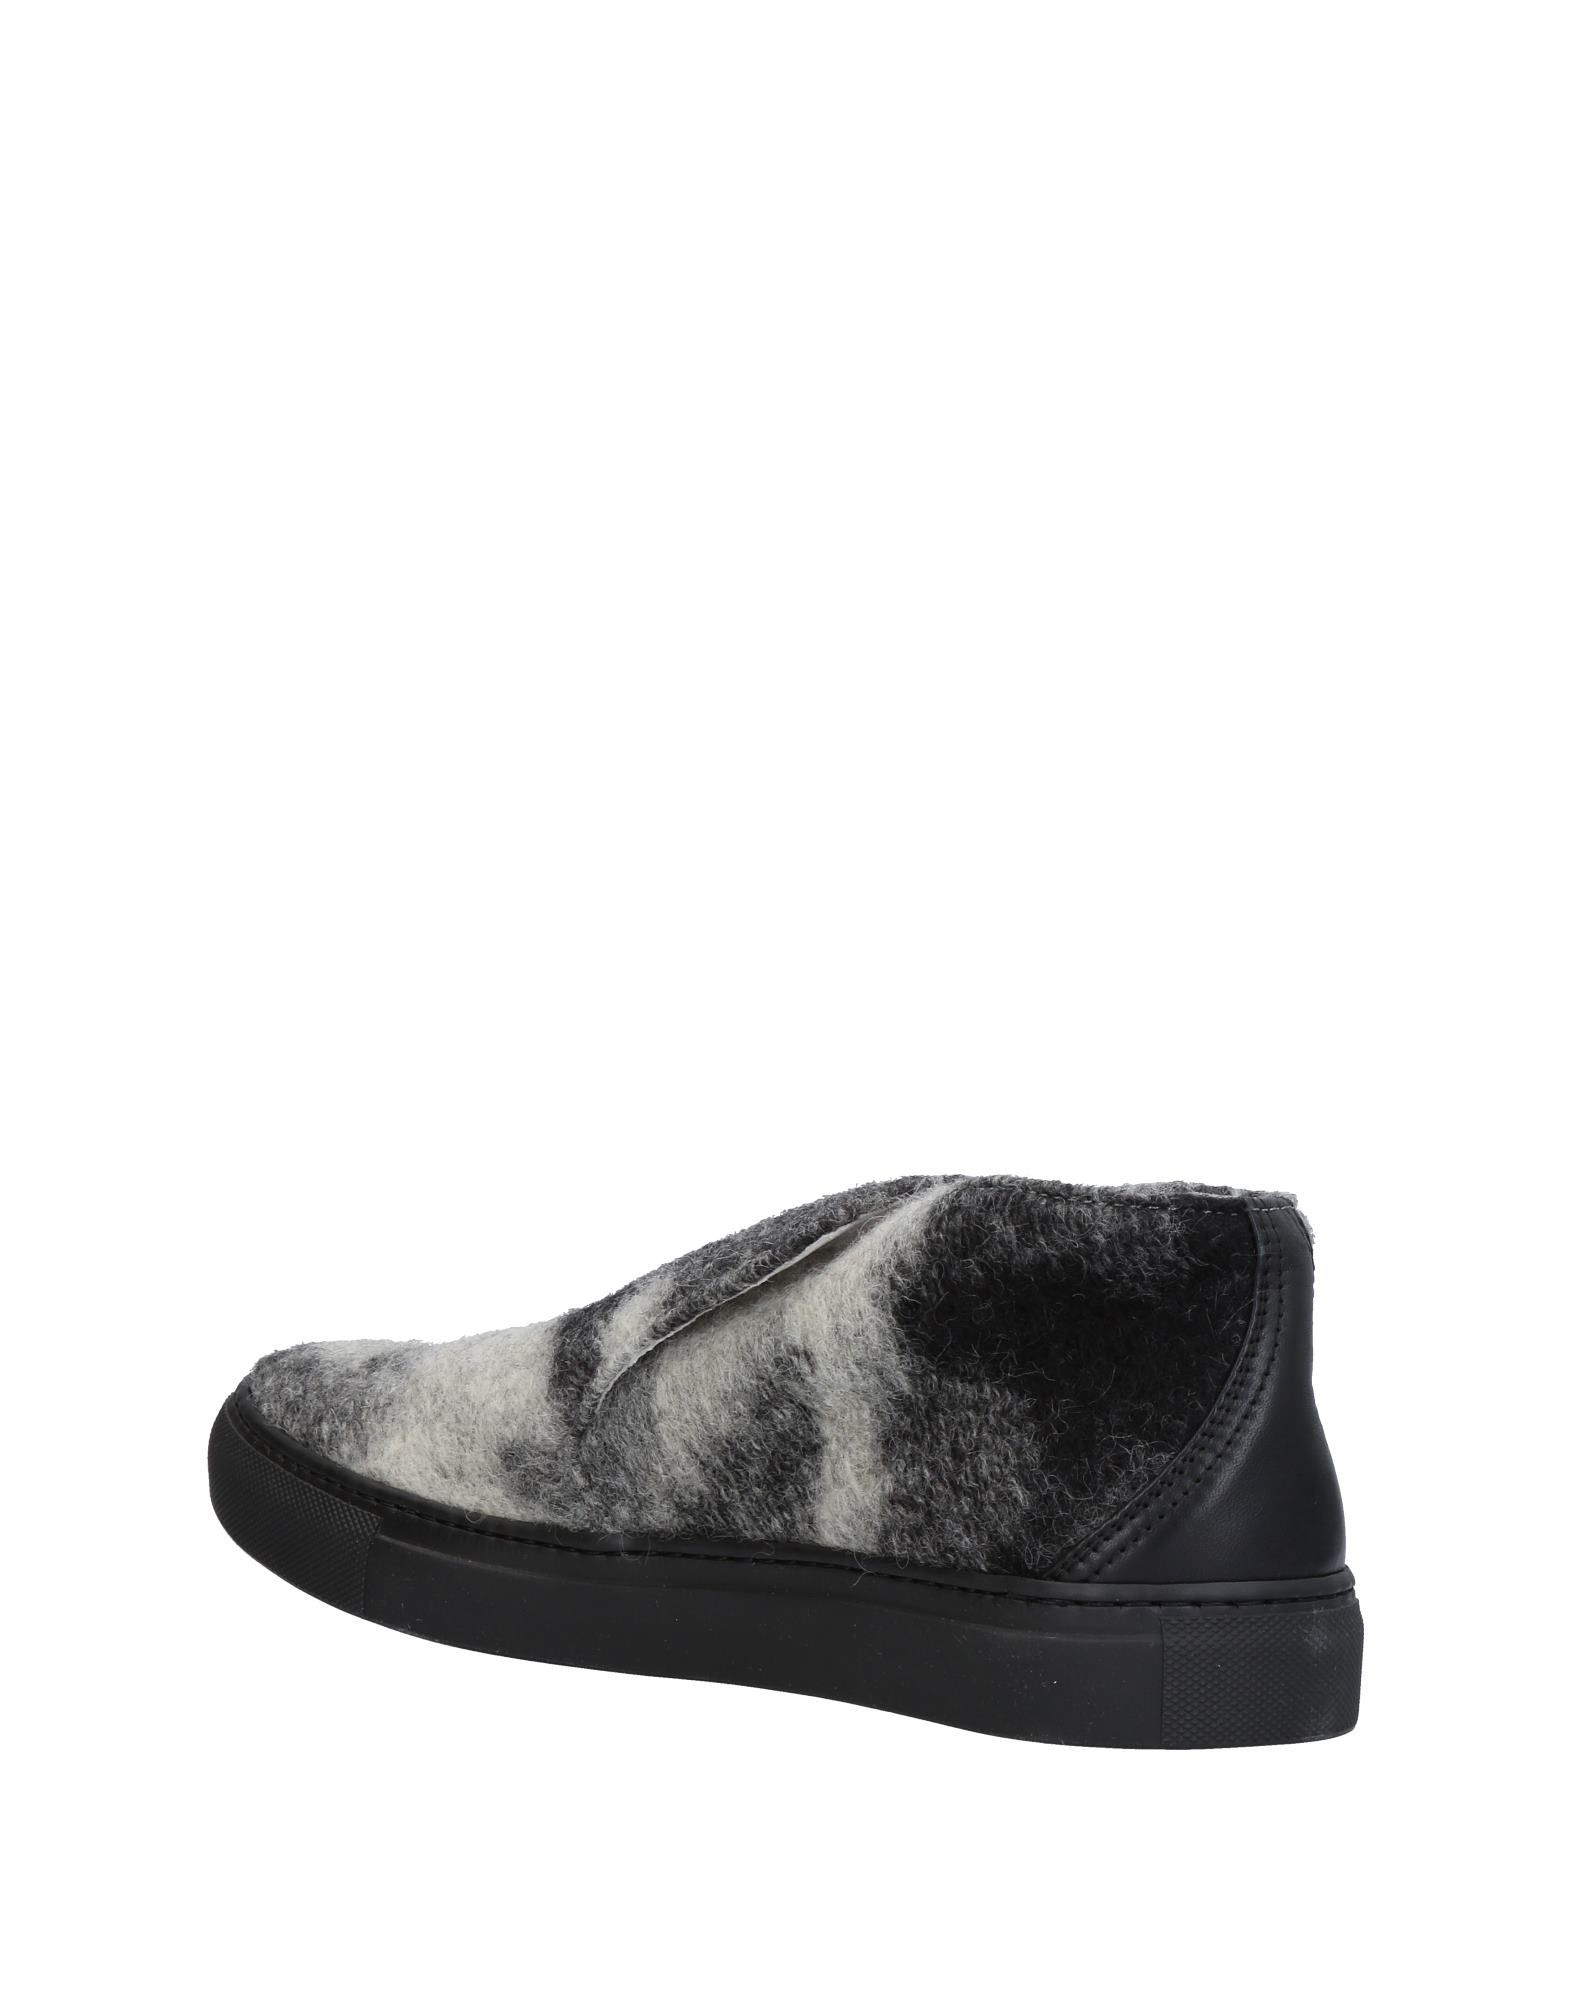 Moda Sneakers Joshua*S Uomo - 11438042CE